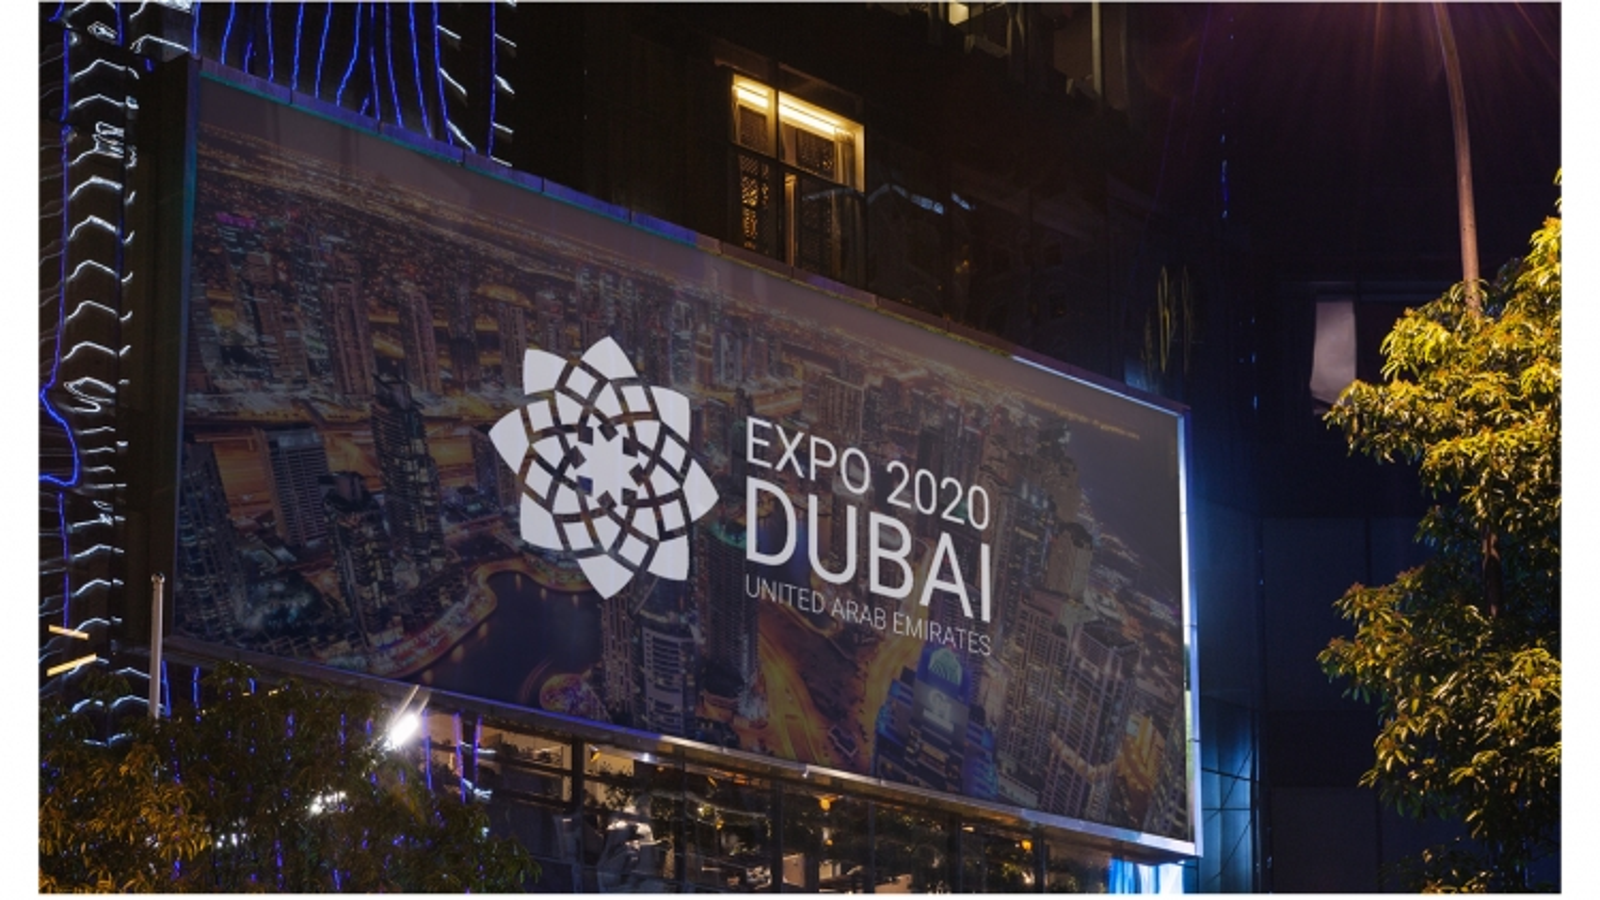 Vietnamese films to be shown at World Expo 2020 Dubai